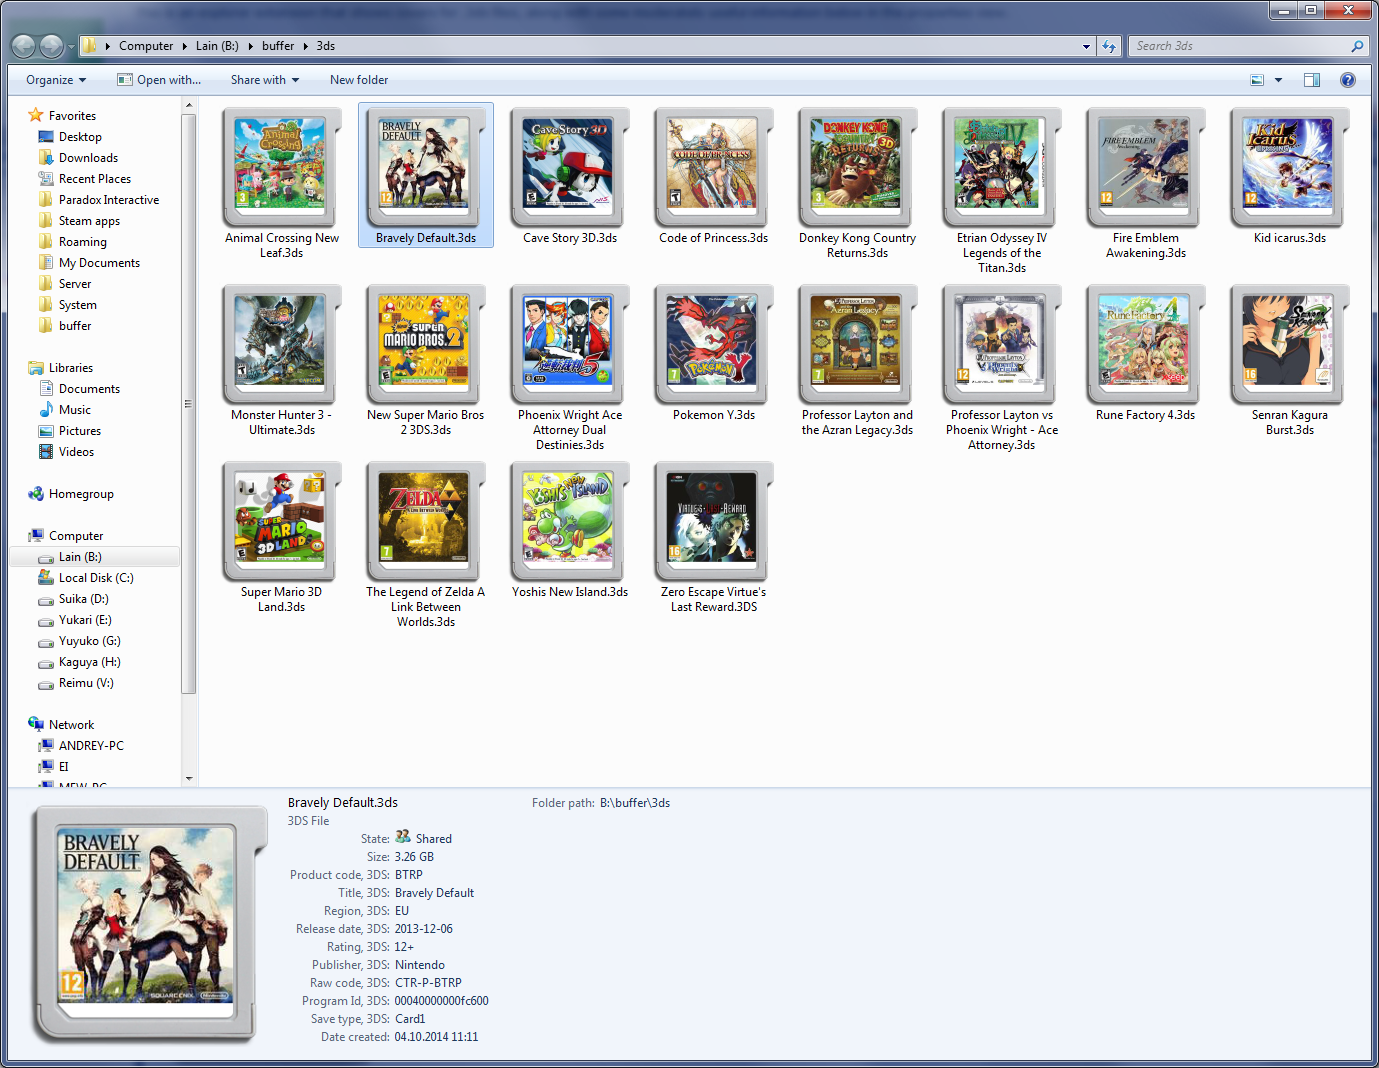 GBXemu - #1 Source for Gameboy Emulators